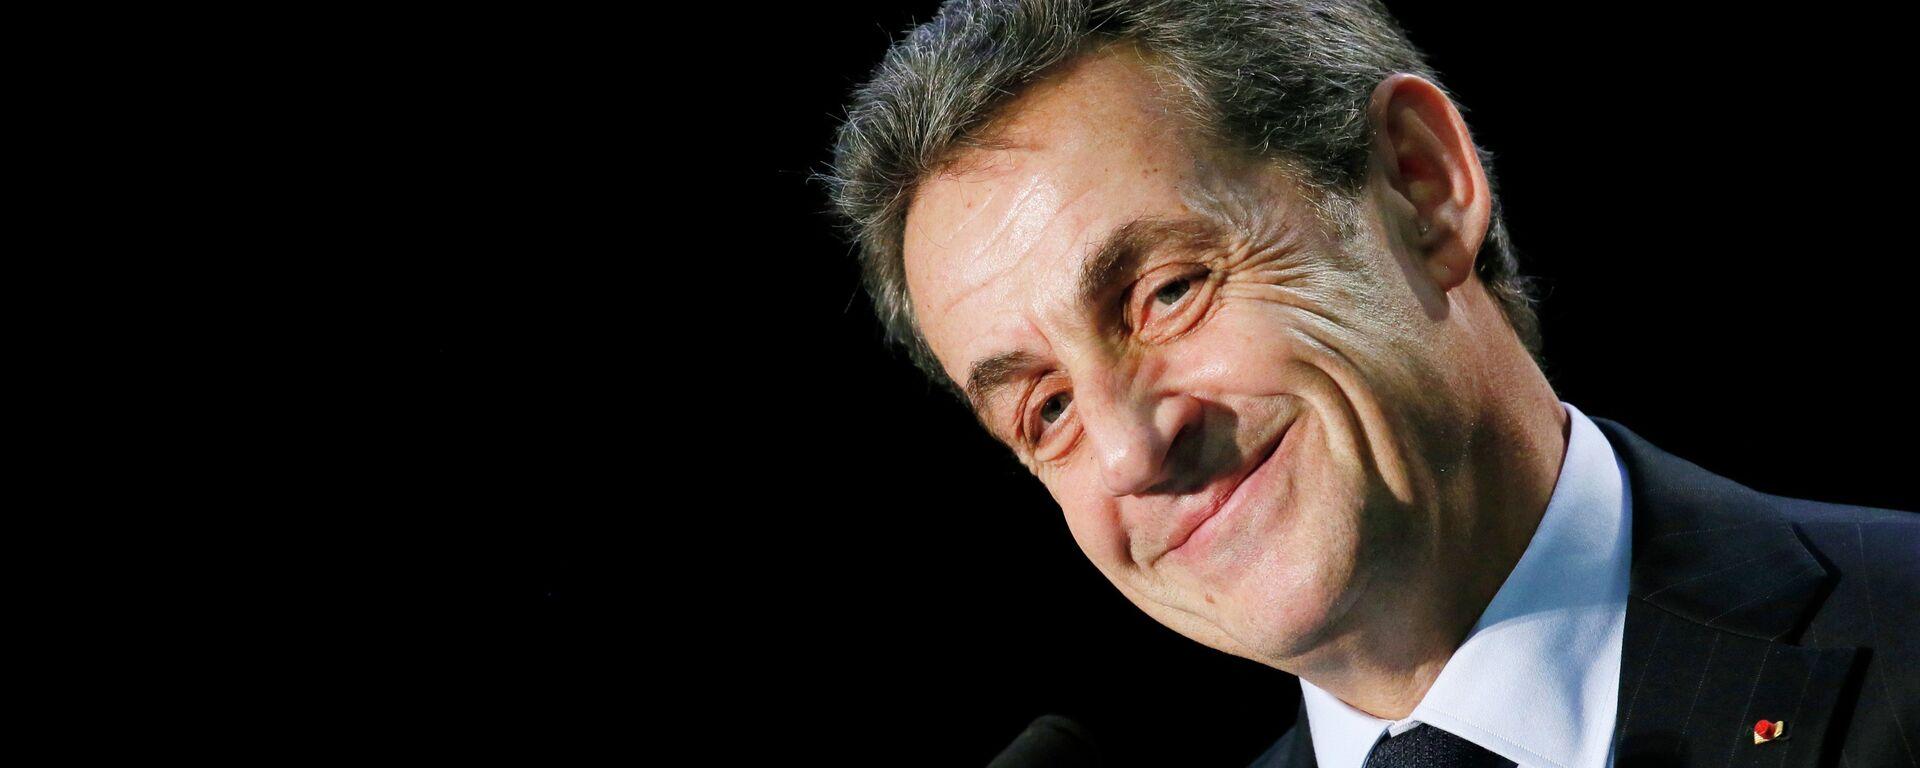 Nicolas Sarkozy, ex-presidente francese e il leader di UMP  - Sputnik Italia, 1920, 30.09.2021